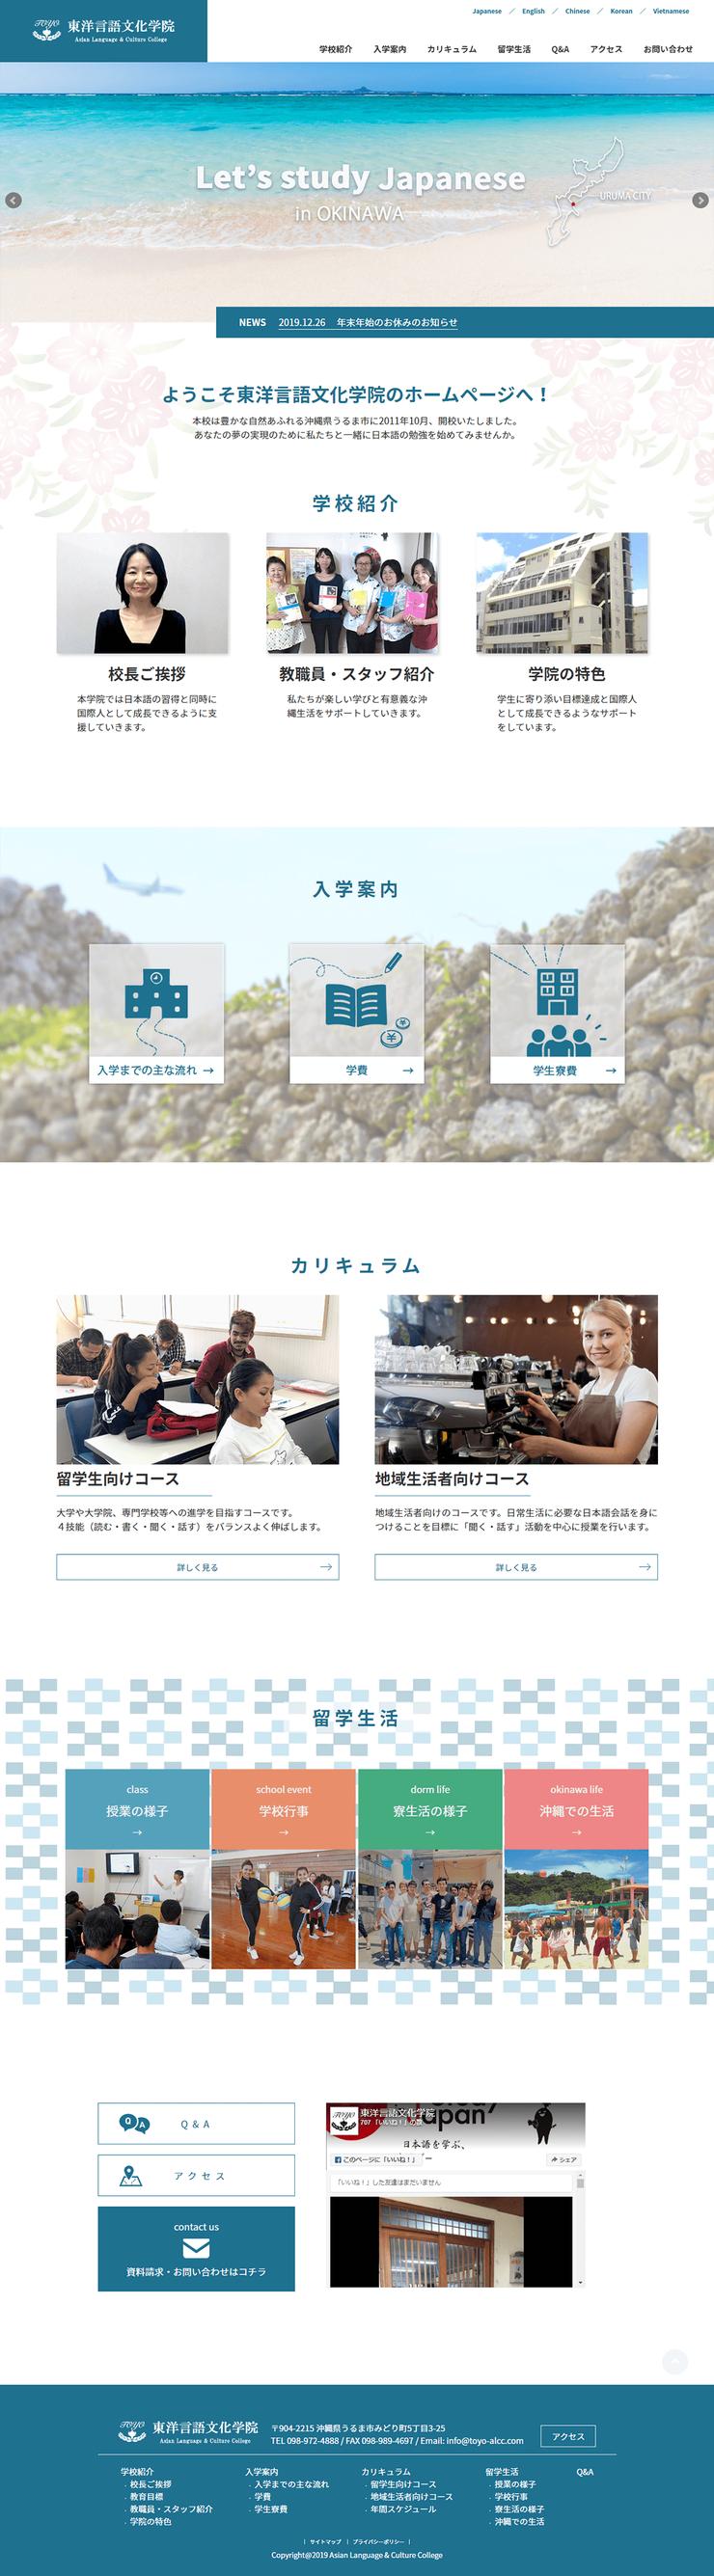 東洋言語文化学院サイトtop_full